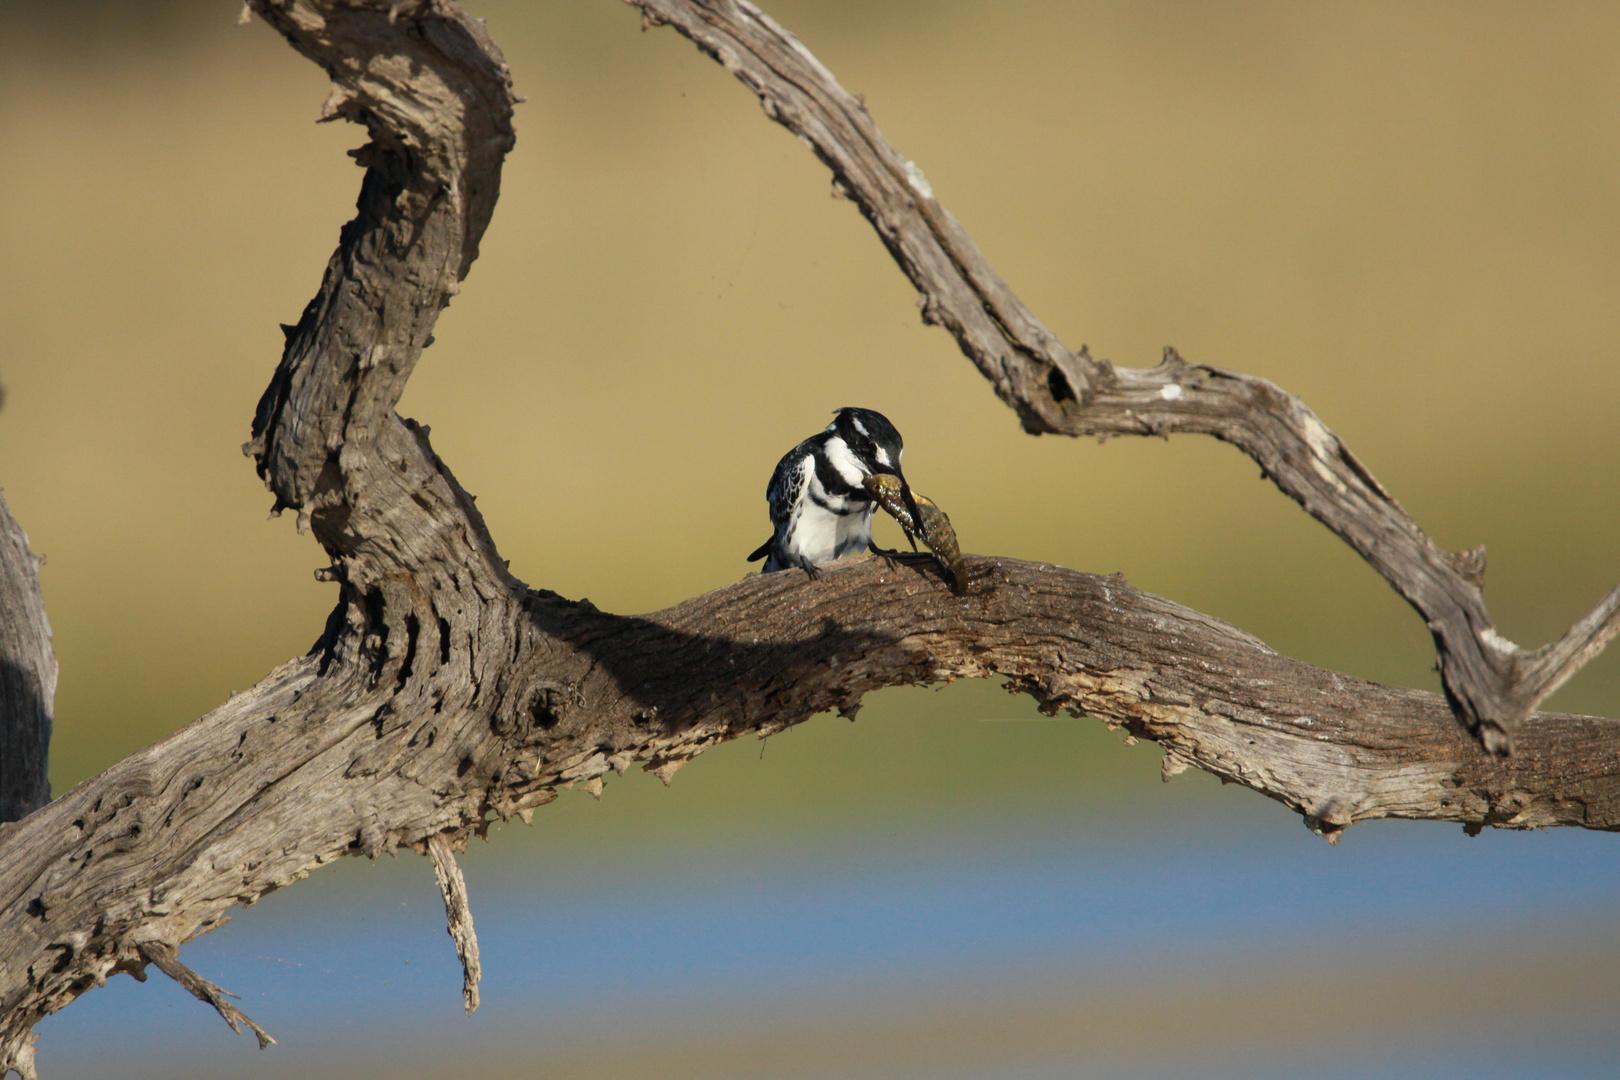 Pied Kingfisher mit Beute